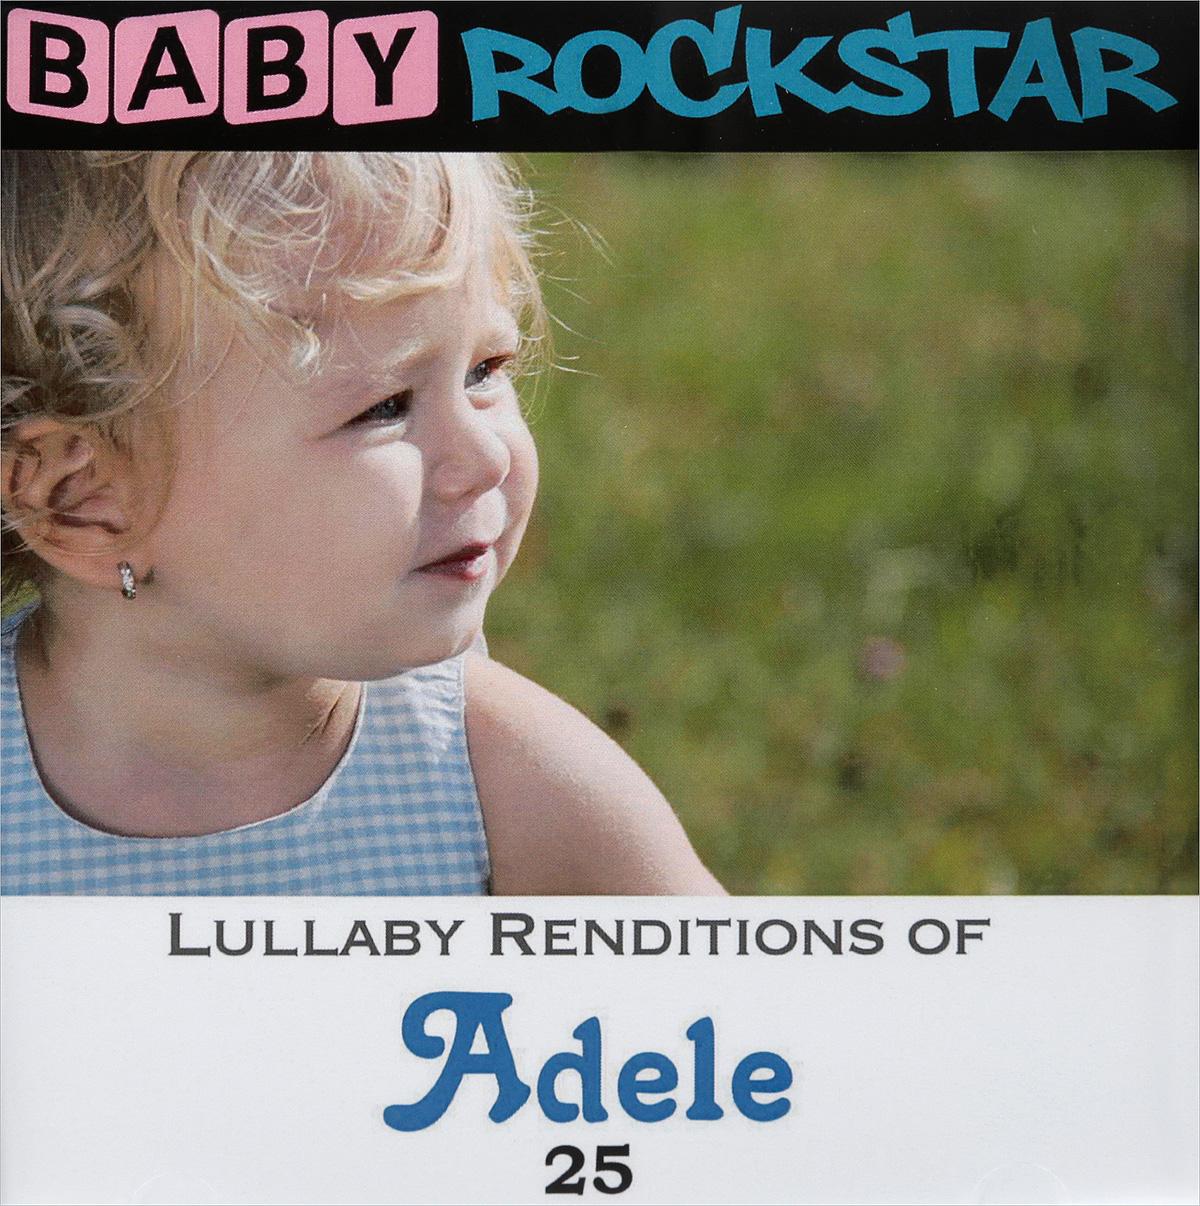 Adele Baby Rockstar. Lullaby Renditions Of Adele 25 adele 25 lp